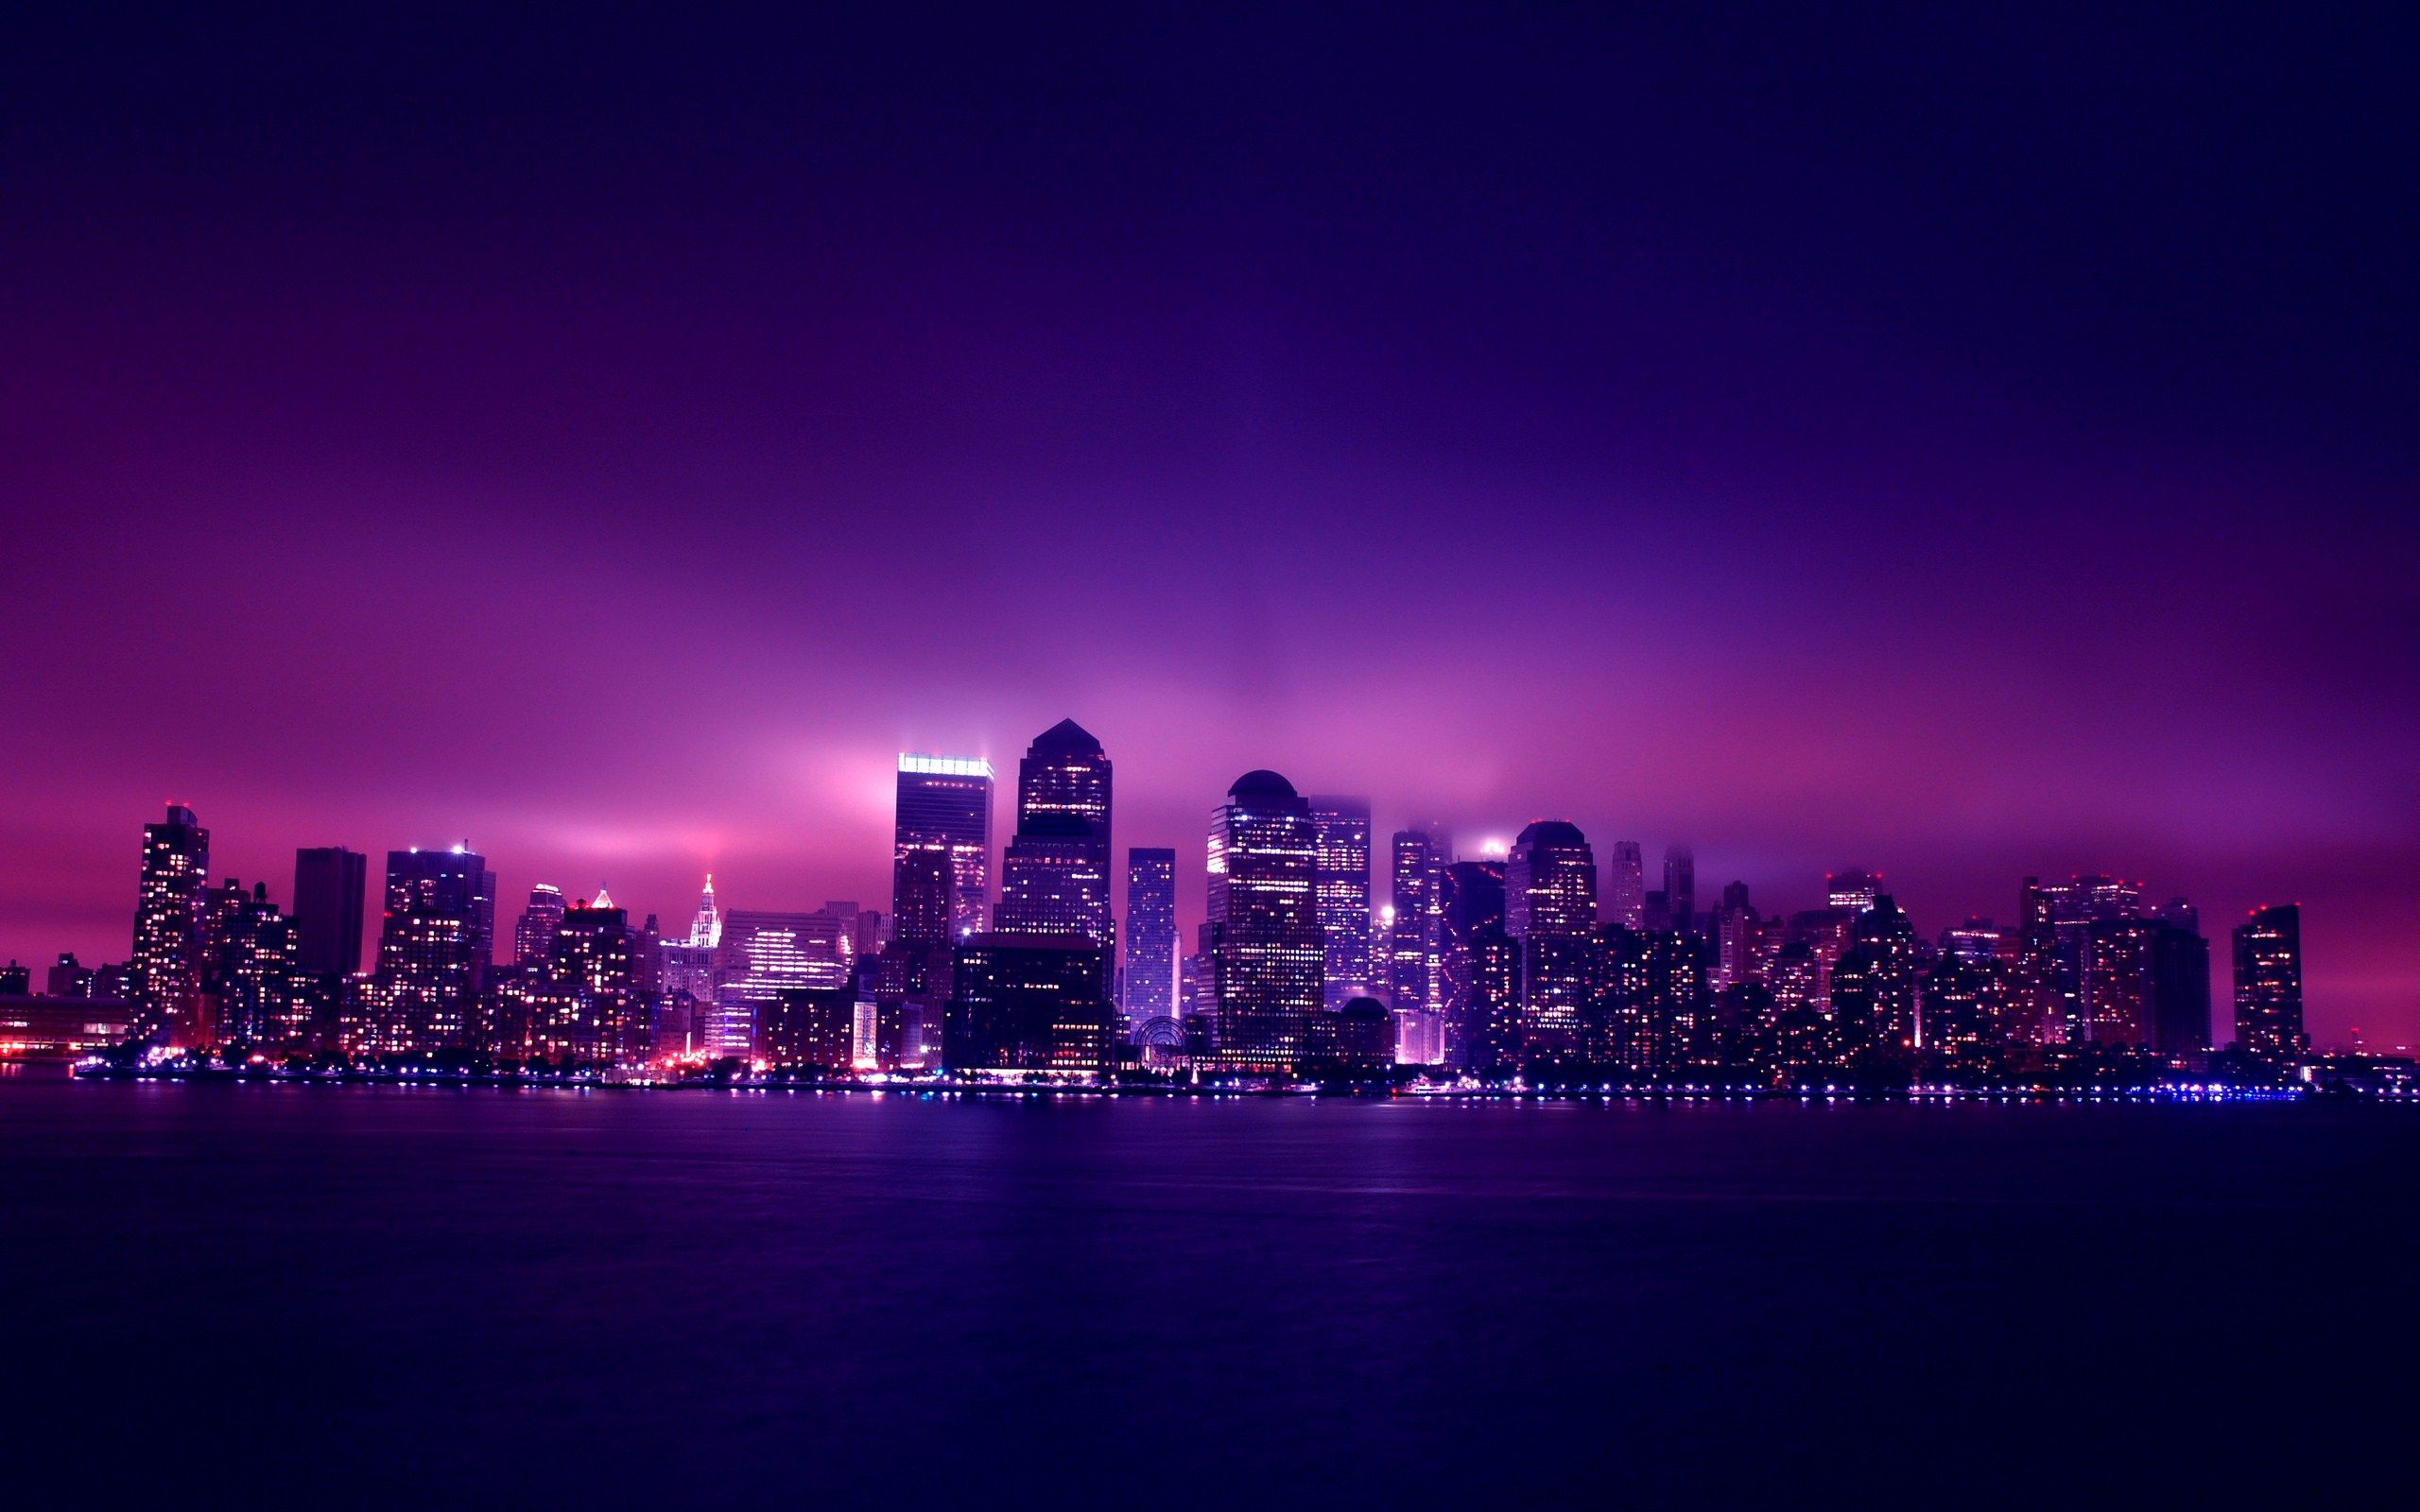 Night city images landscape wallpapers pinterest - Night light city wallpaper ...